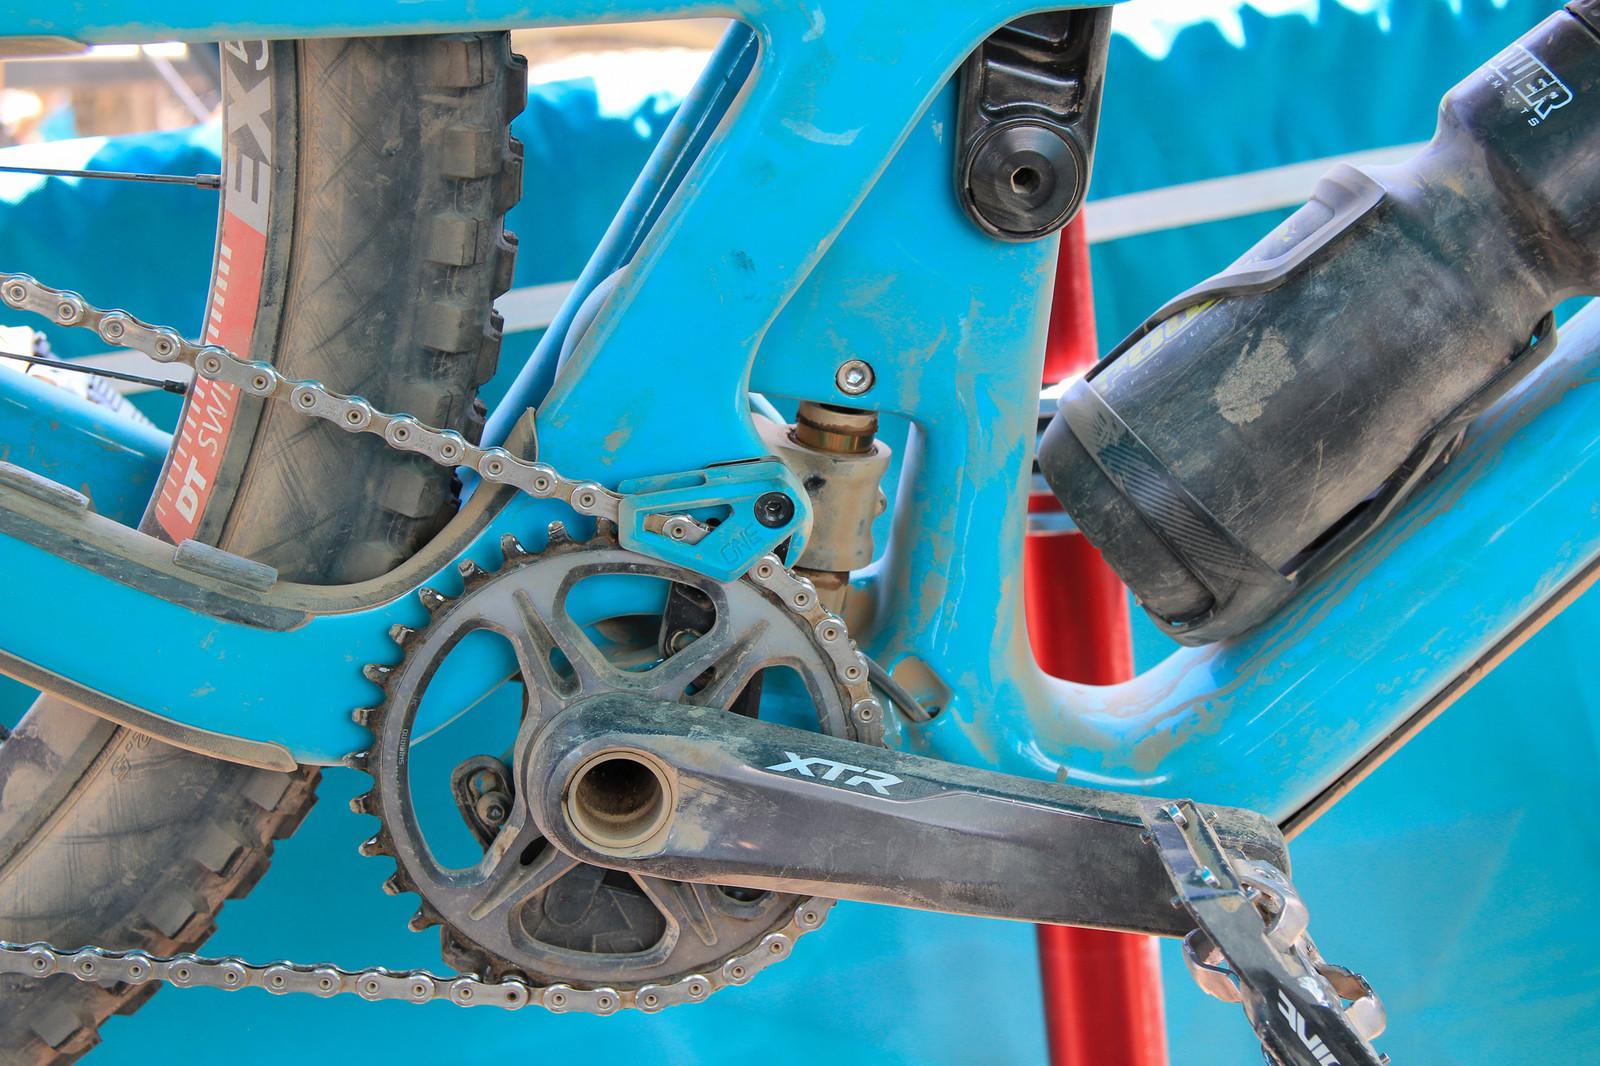 Infinitely Dusty - Pit Bits 2019 Enduro World Series - Northstar - Mountain Biking Pictures - Vital MTB